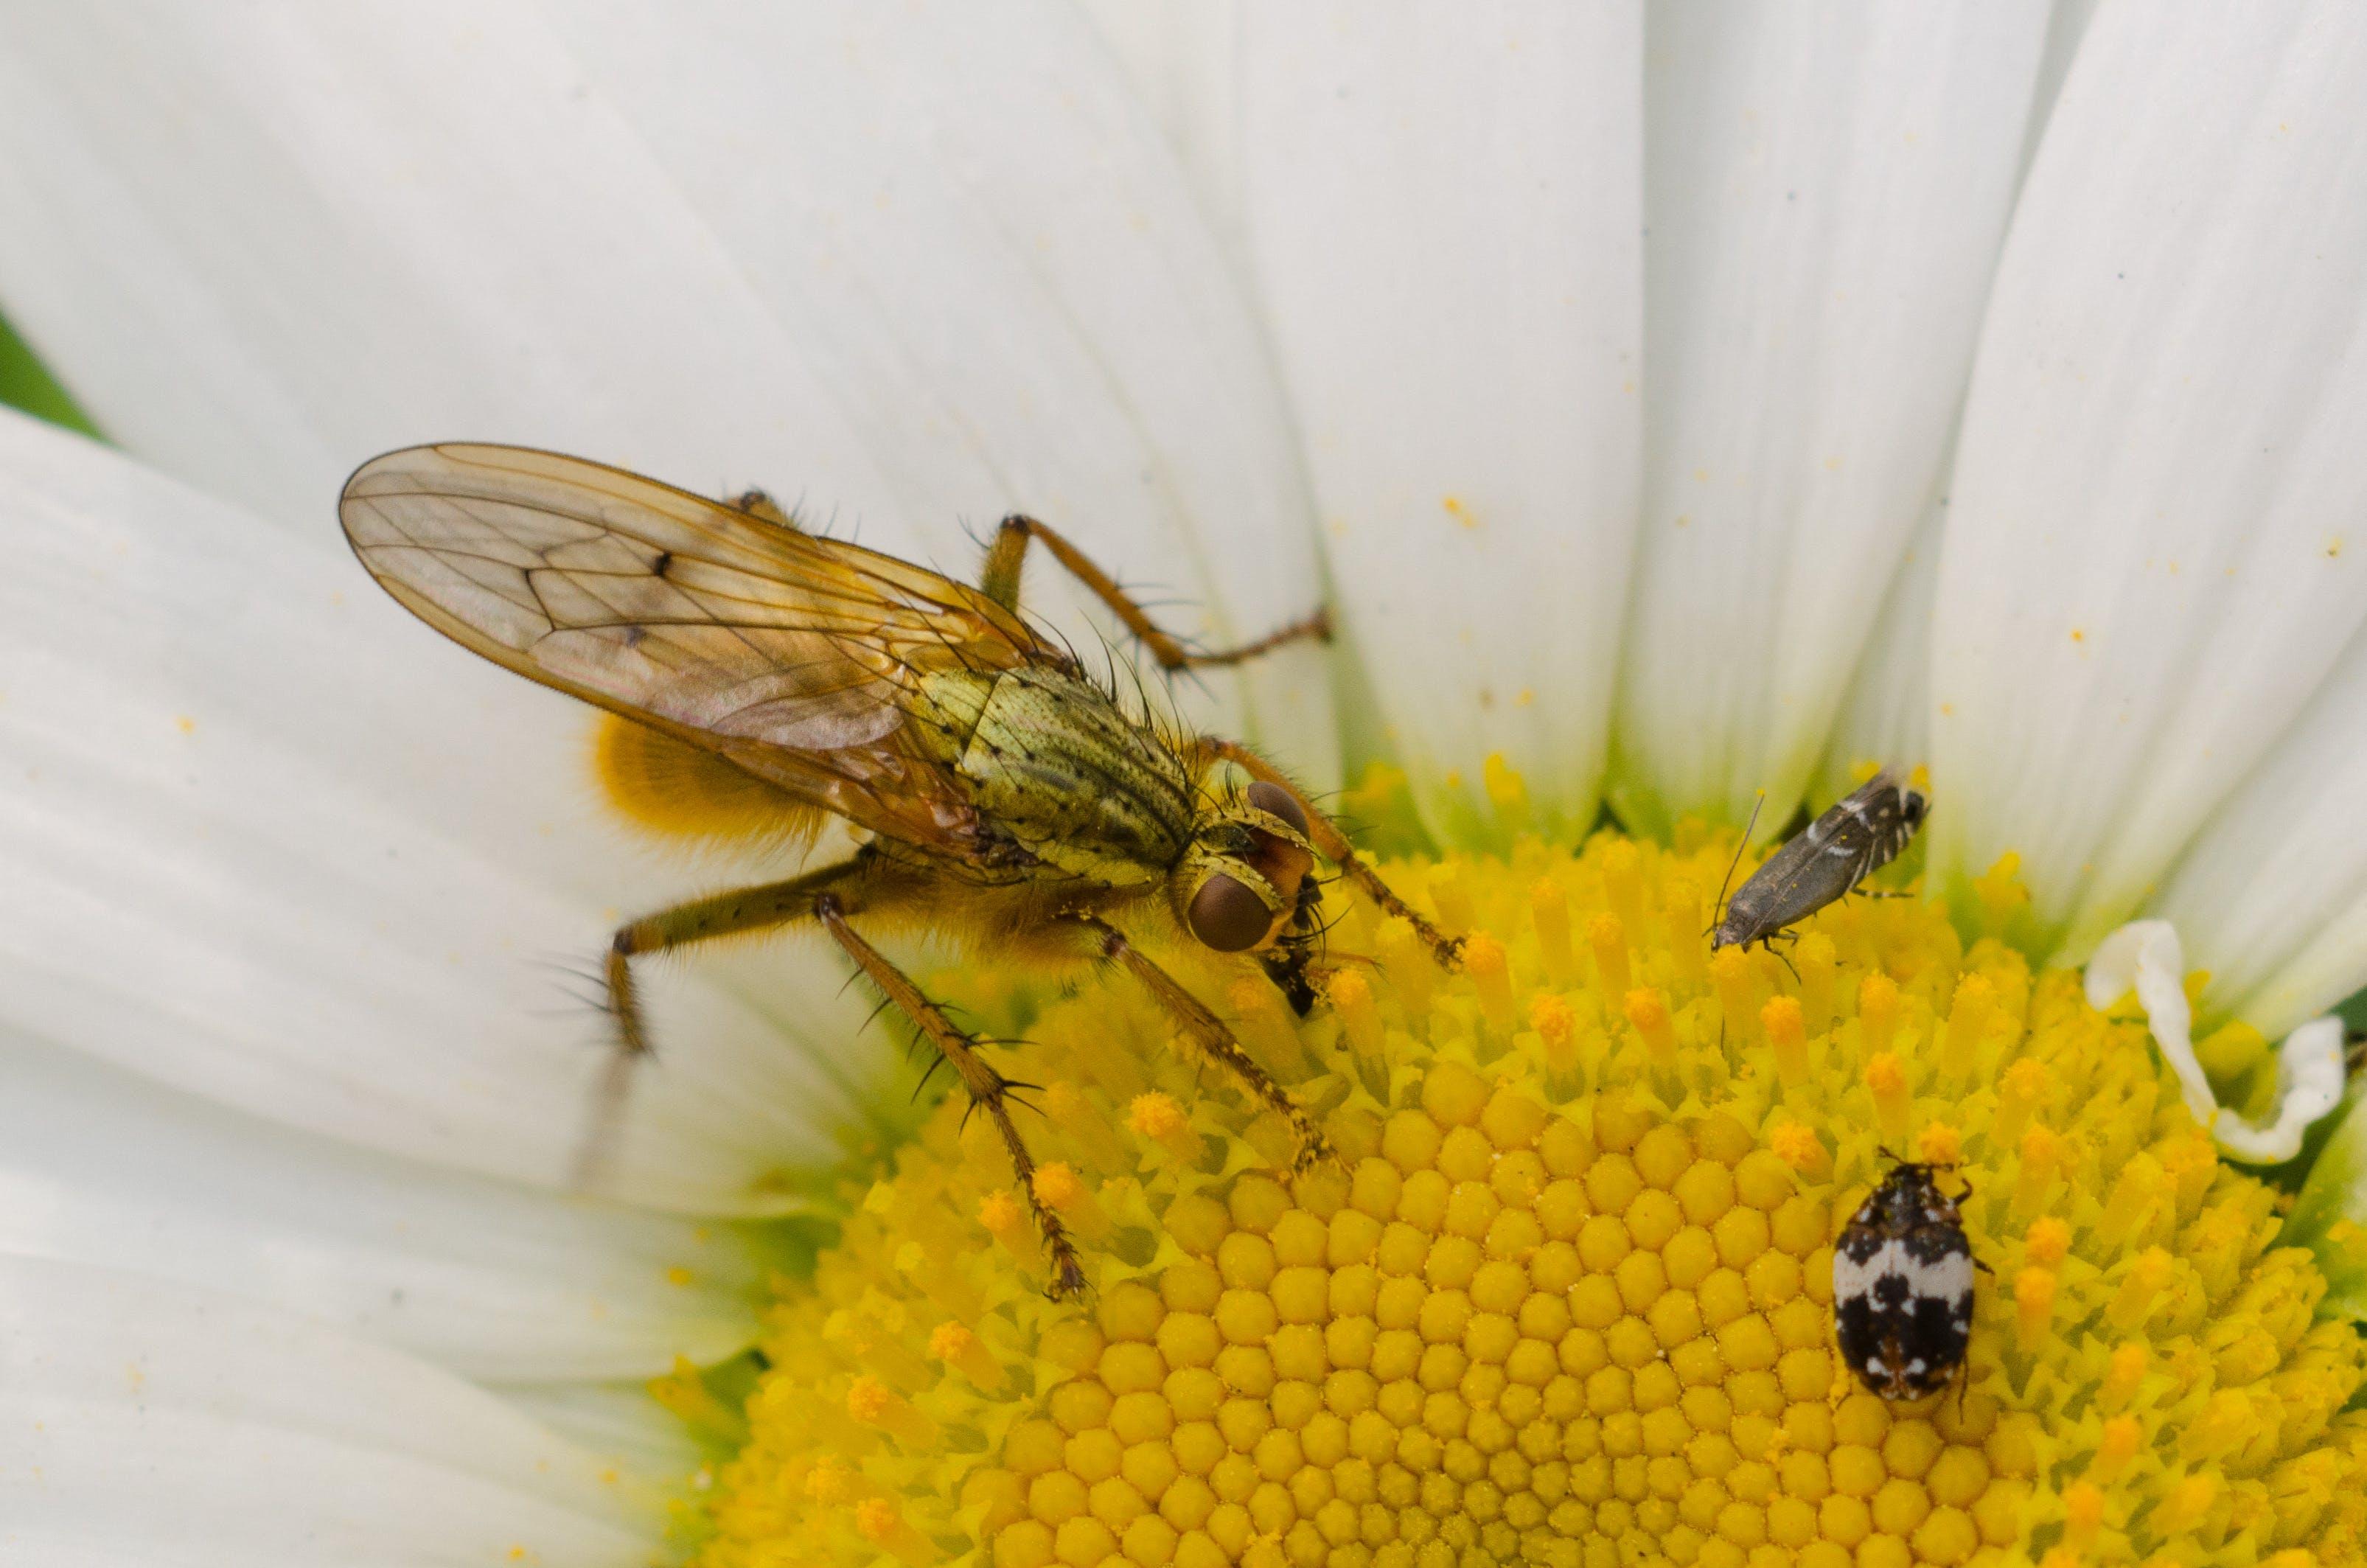 animal, bug, close-up